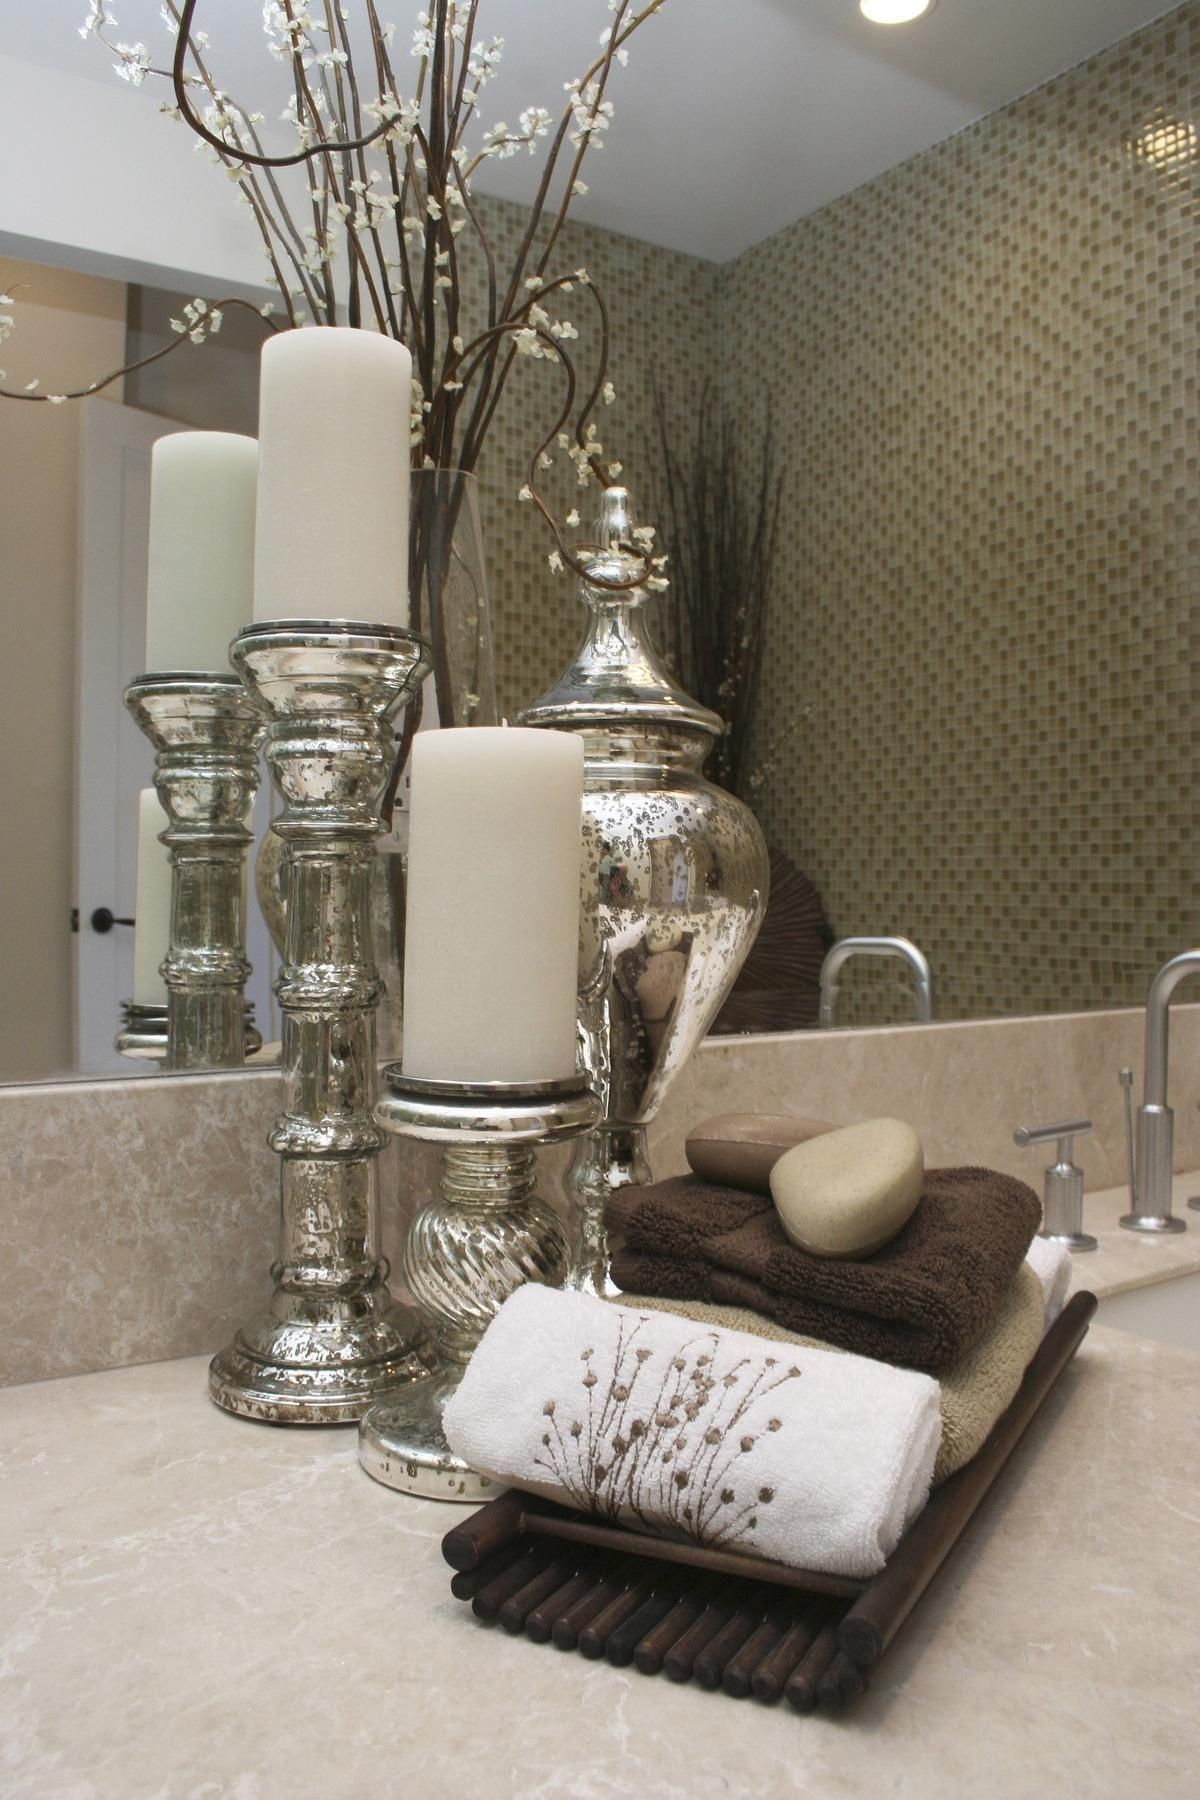 Decor for apt decor for apt bathroom spa